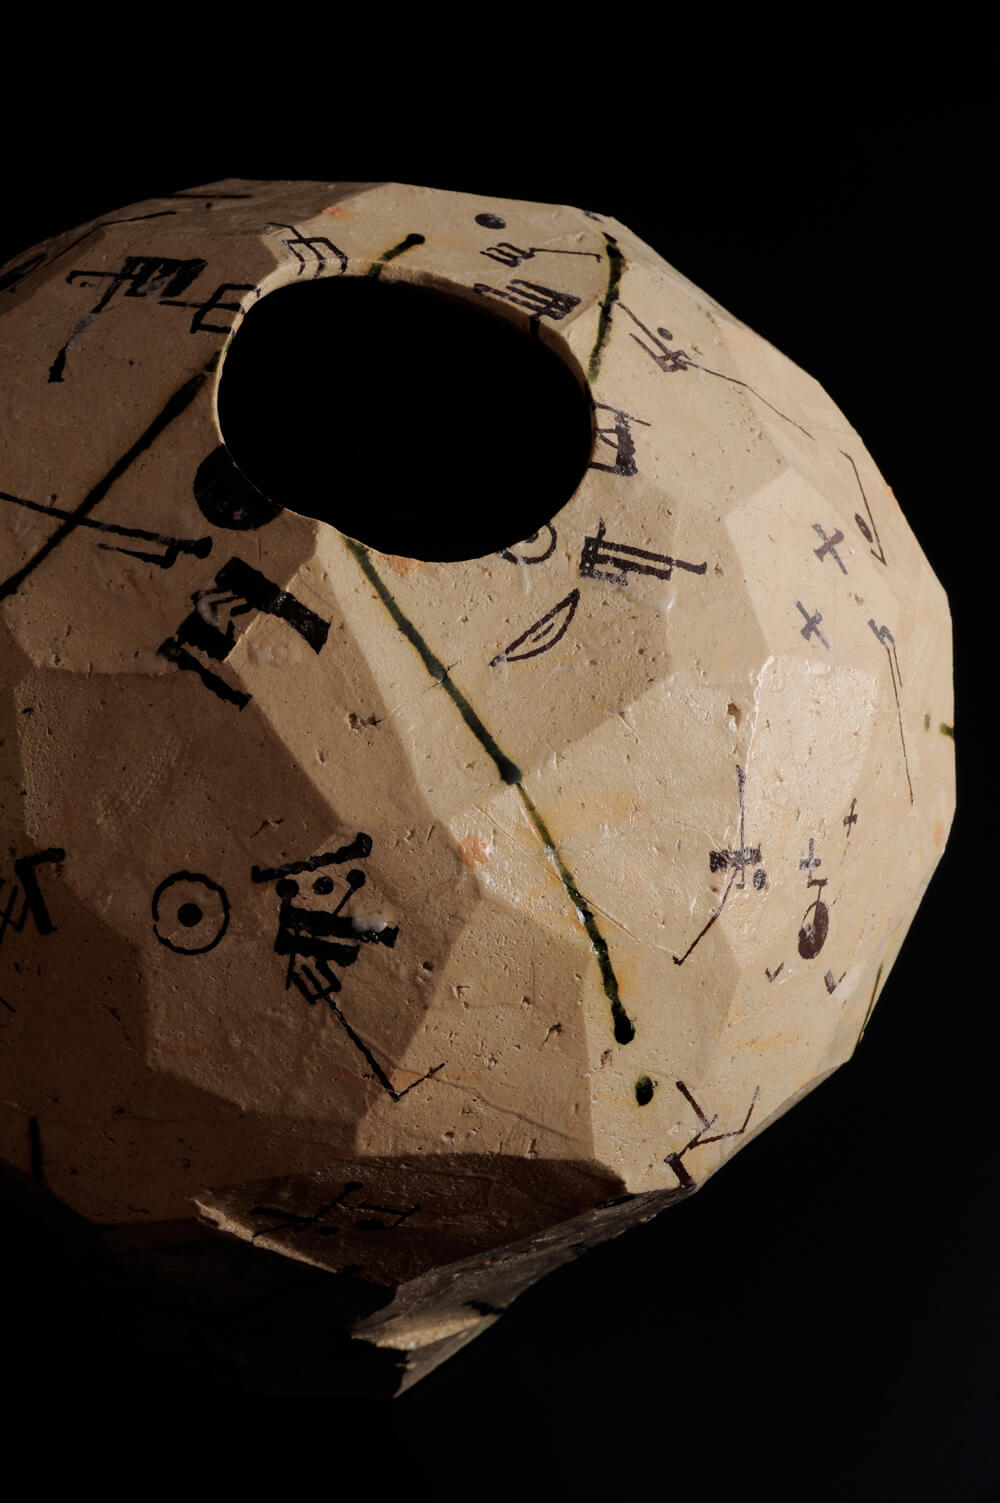 2011年6月25日から開催の「織部考 加藤 亮太郎 陶展」の加藤 亮太郎の作品画像2